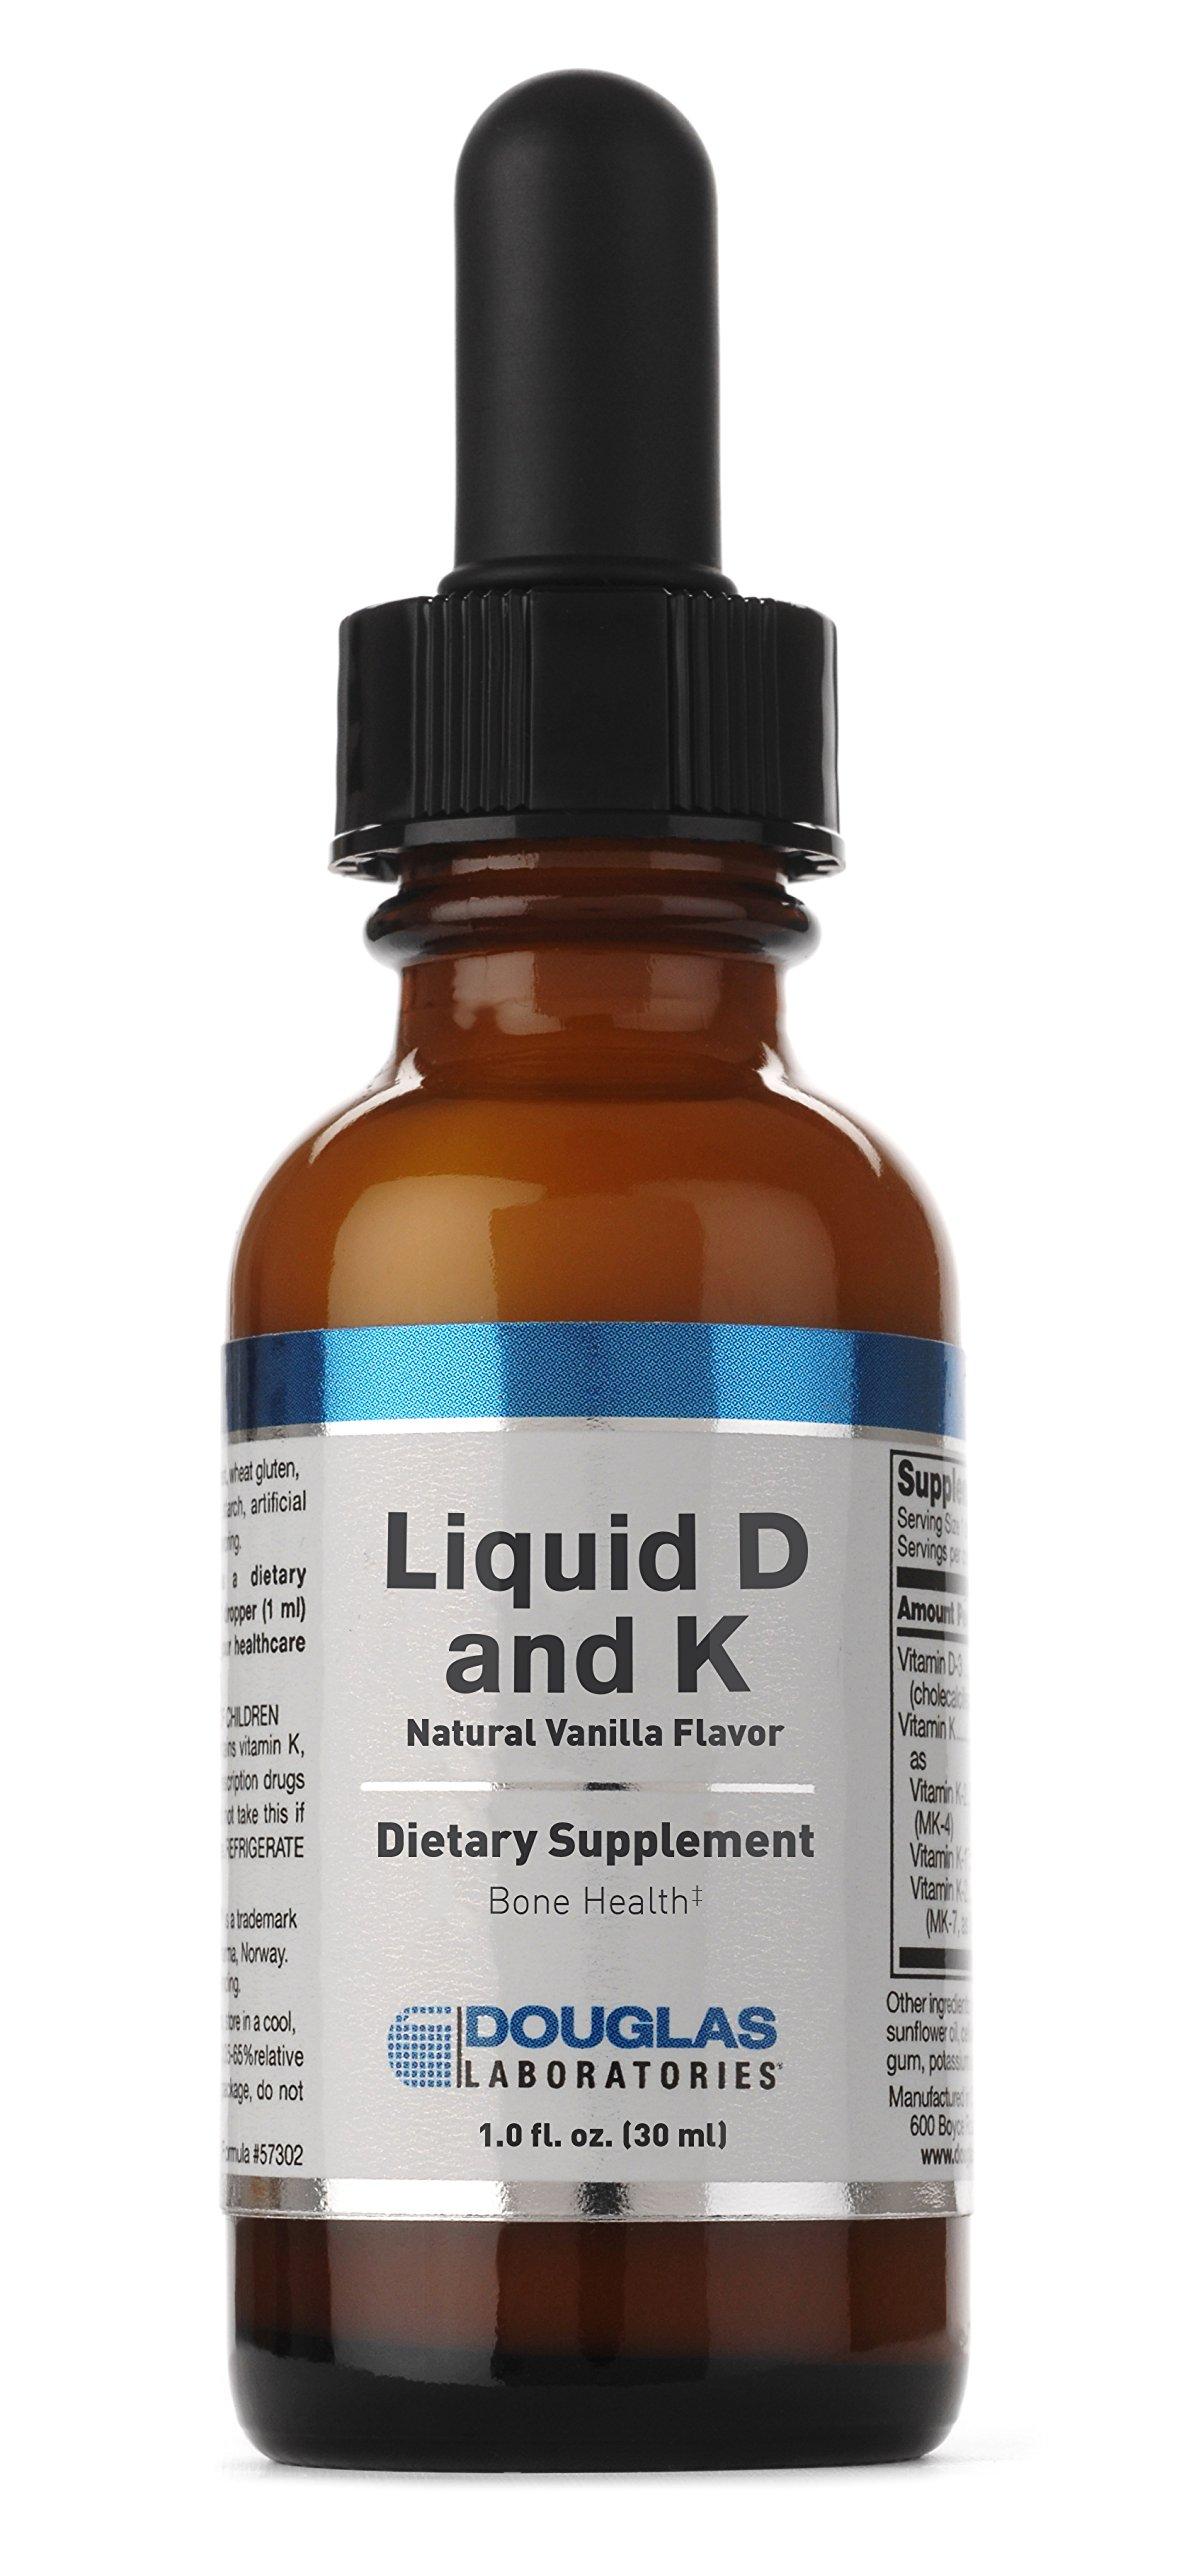 Douglas Laboratories - Liquid D & K - Vitamins K-1, K-2 and Vitamin D3 to Support Optimal Bone Health* - Natural Vanilla Flavor - 1 fl. oz.